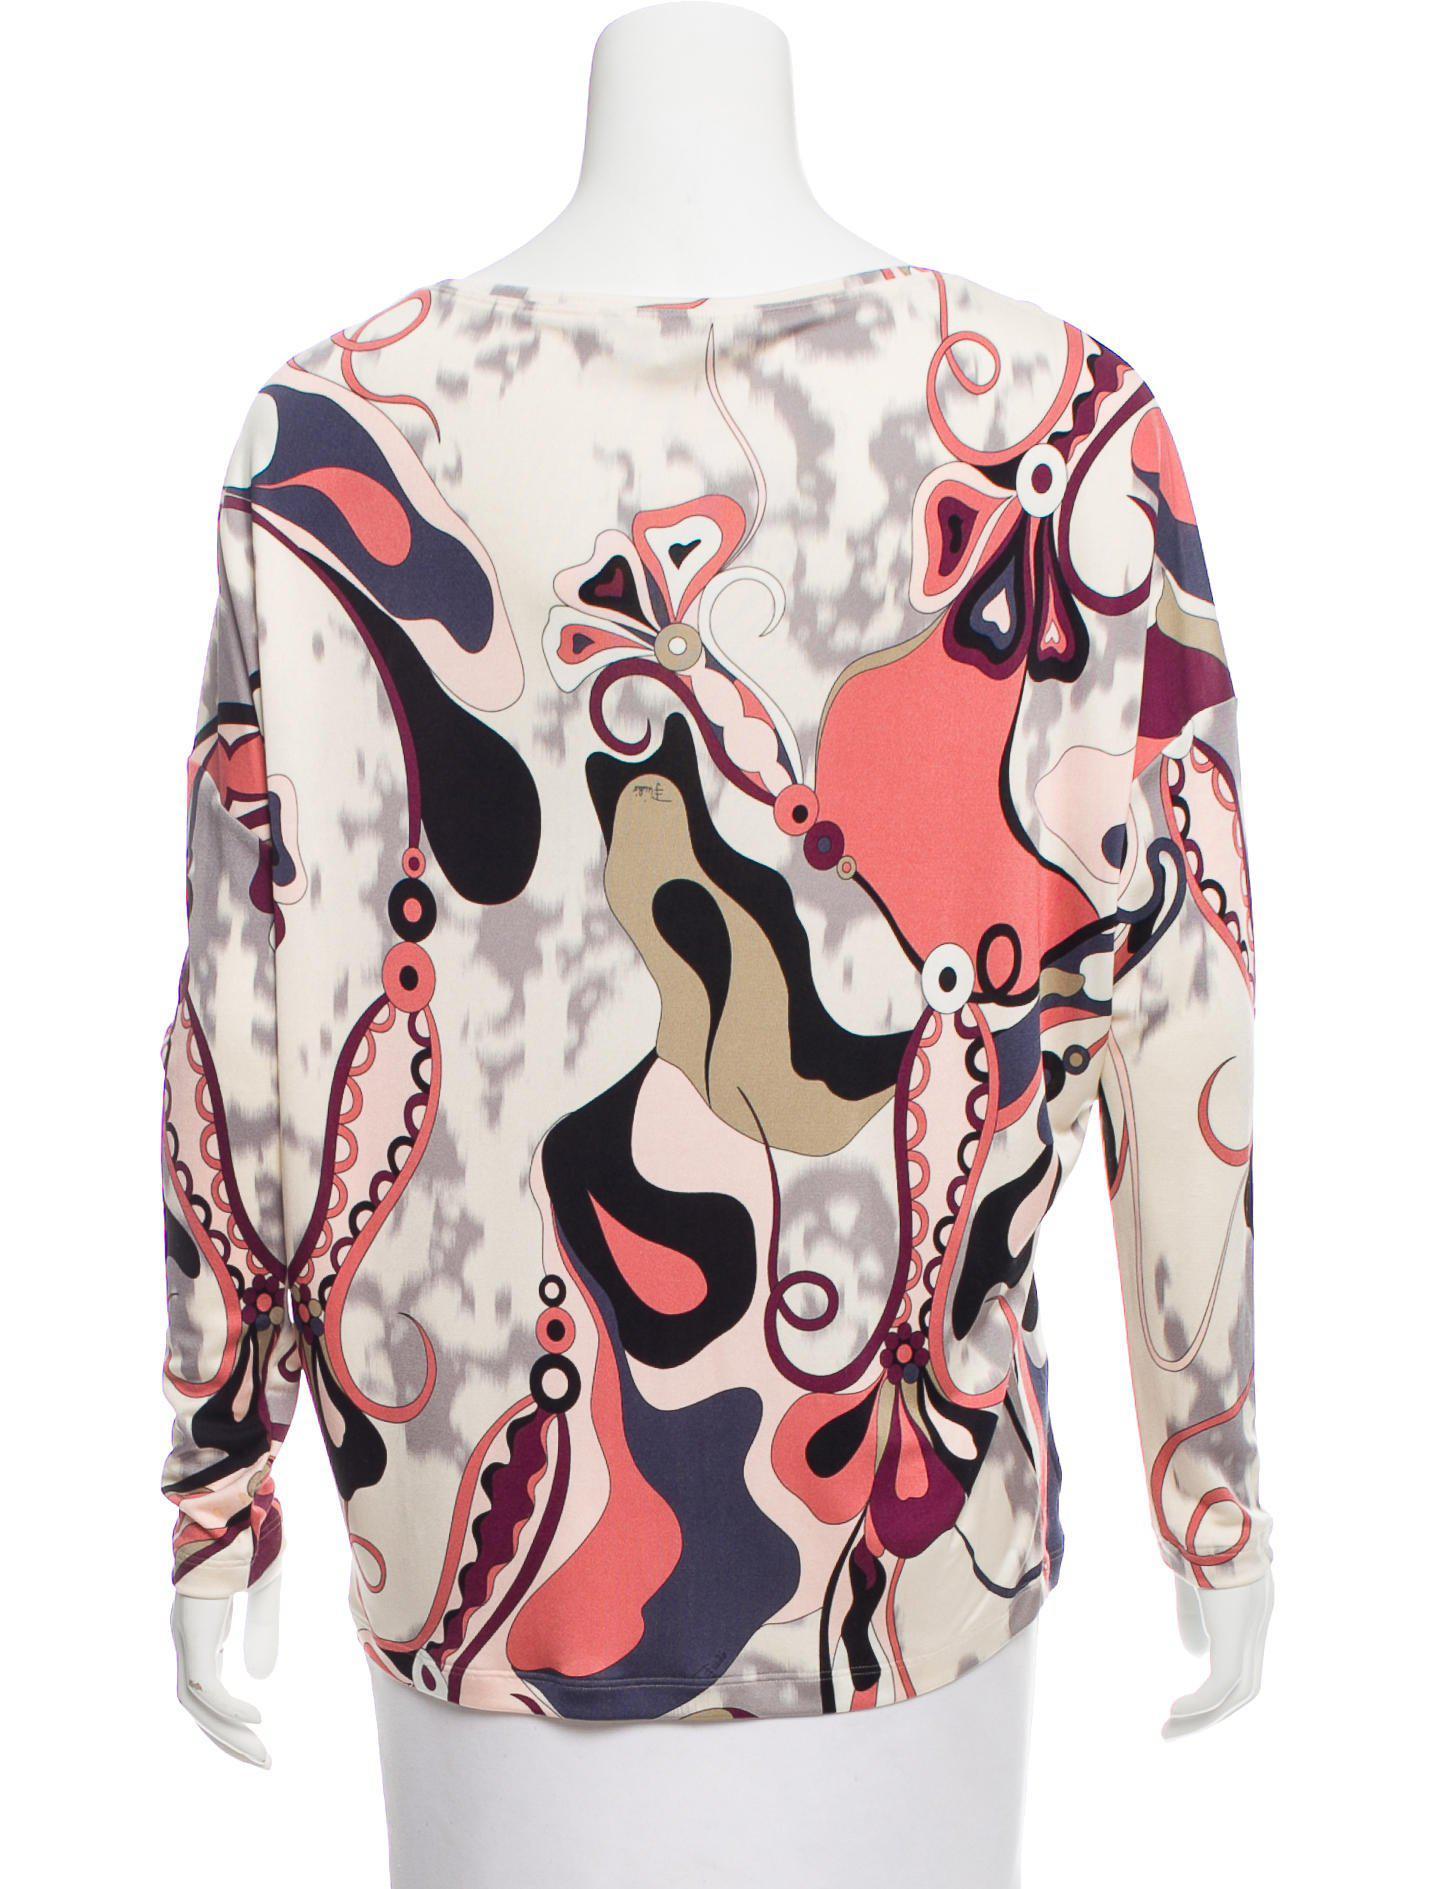 Emilio Pucci Woman Tie-front Crepe Top Plum Size 40 Emilio Pucci Clearance Outlet w4Fyu